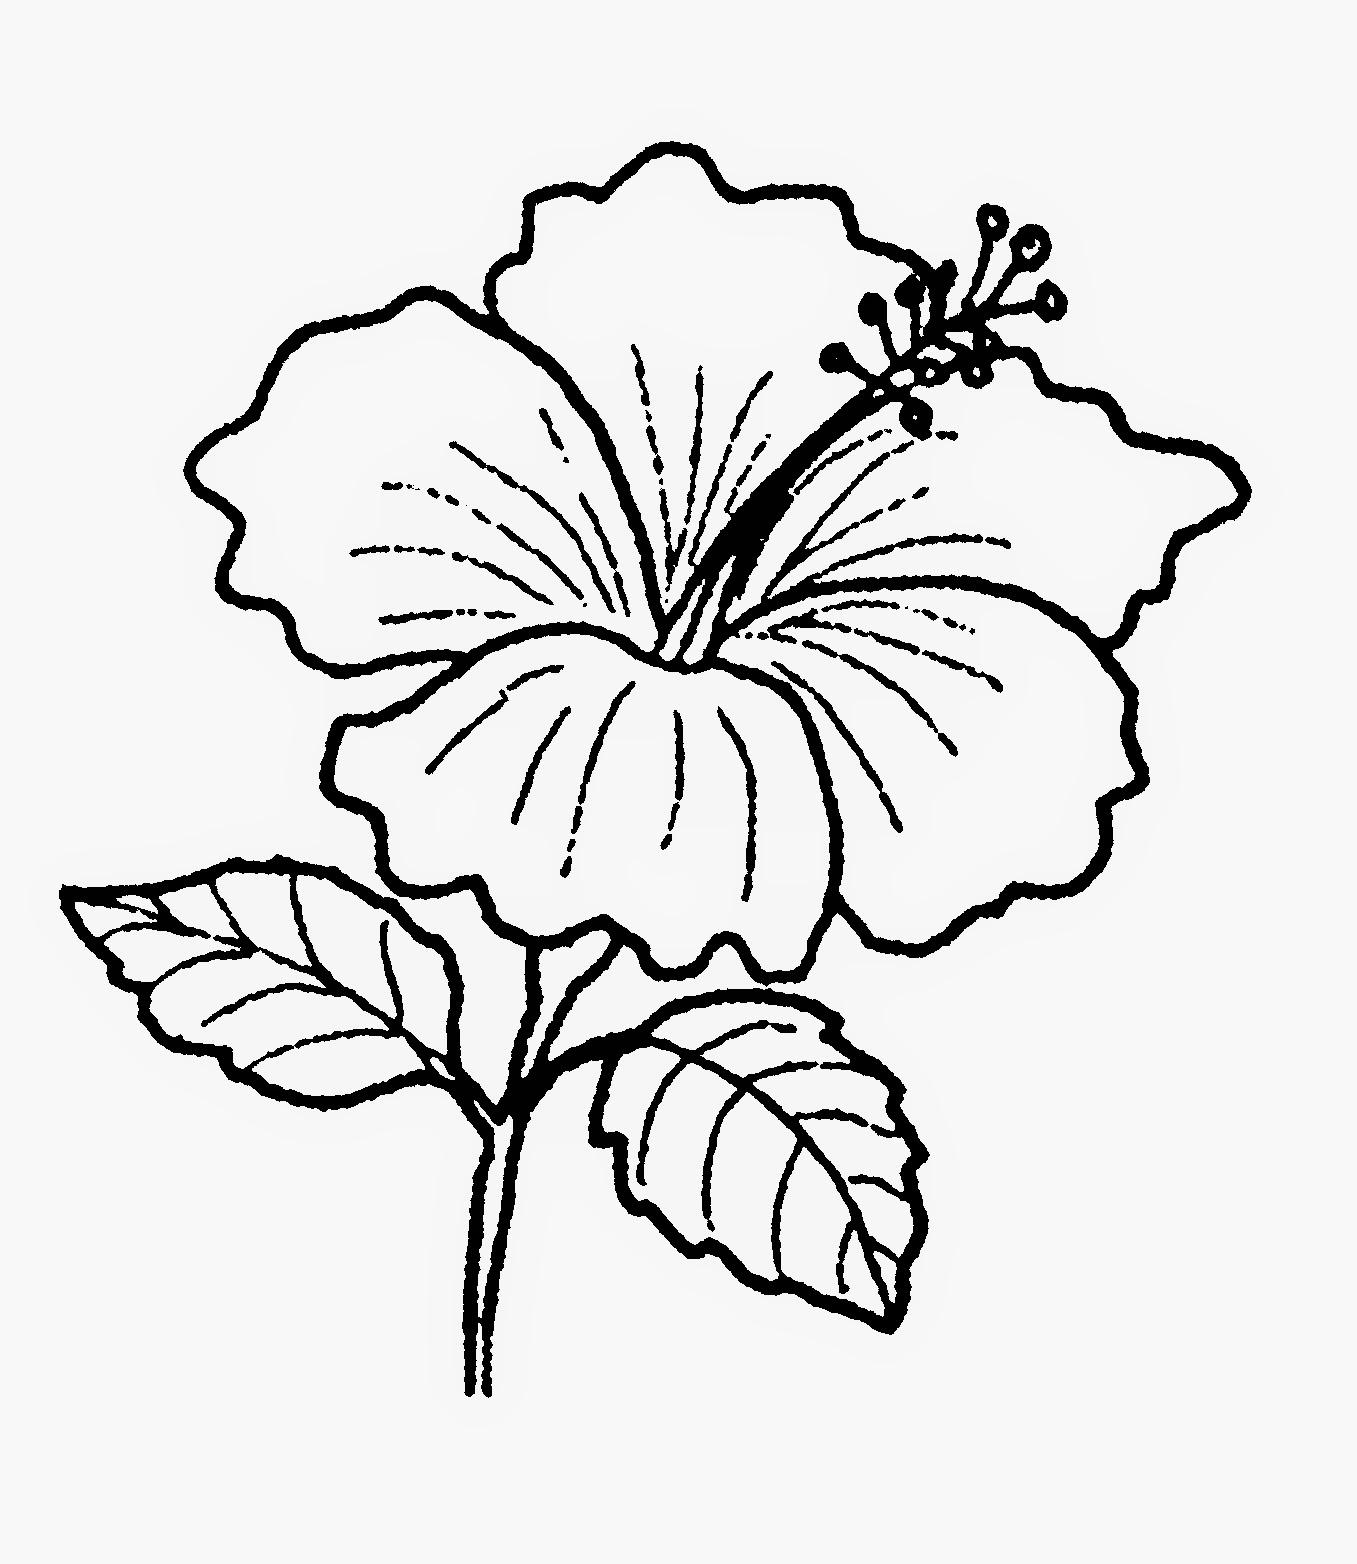 Gambar Bunga Matahari Hitam Putih Iv Kumpulan Gambar